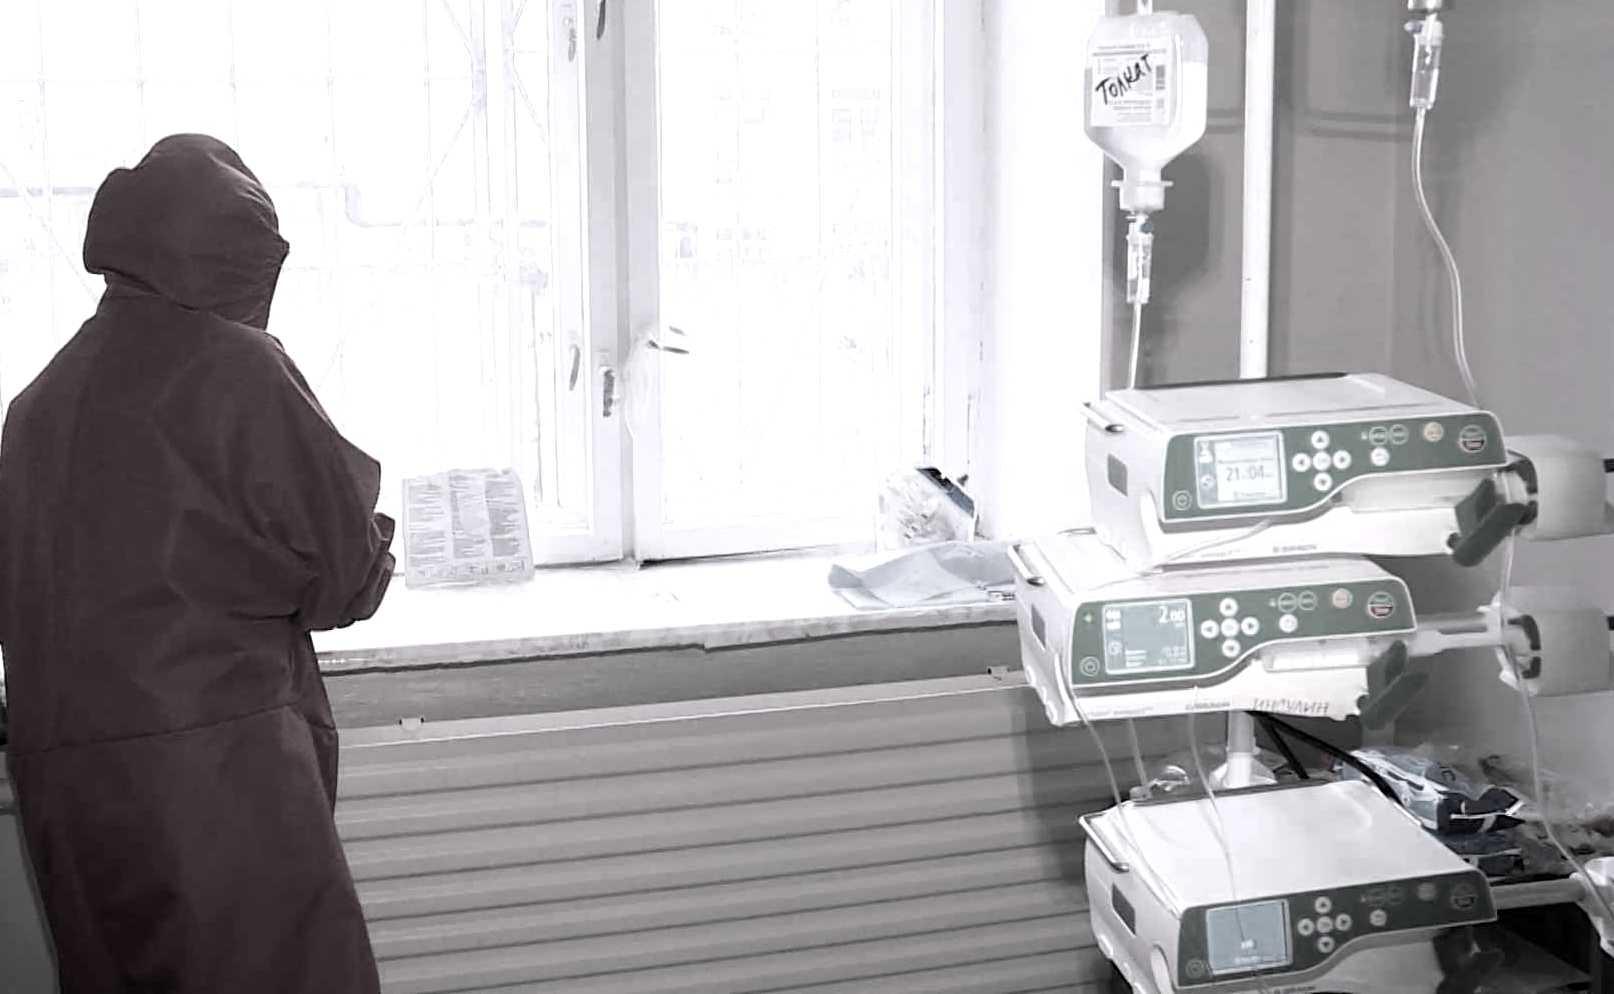 Ещё одна пациентка с COVID-19 скончалась в Костромской области